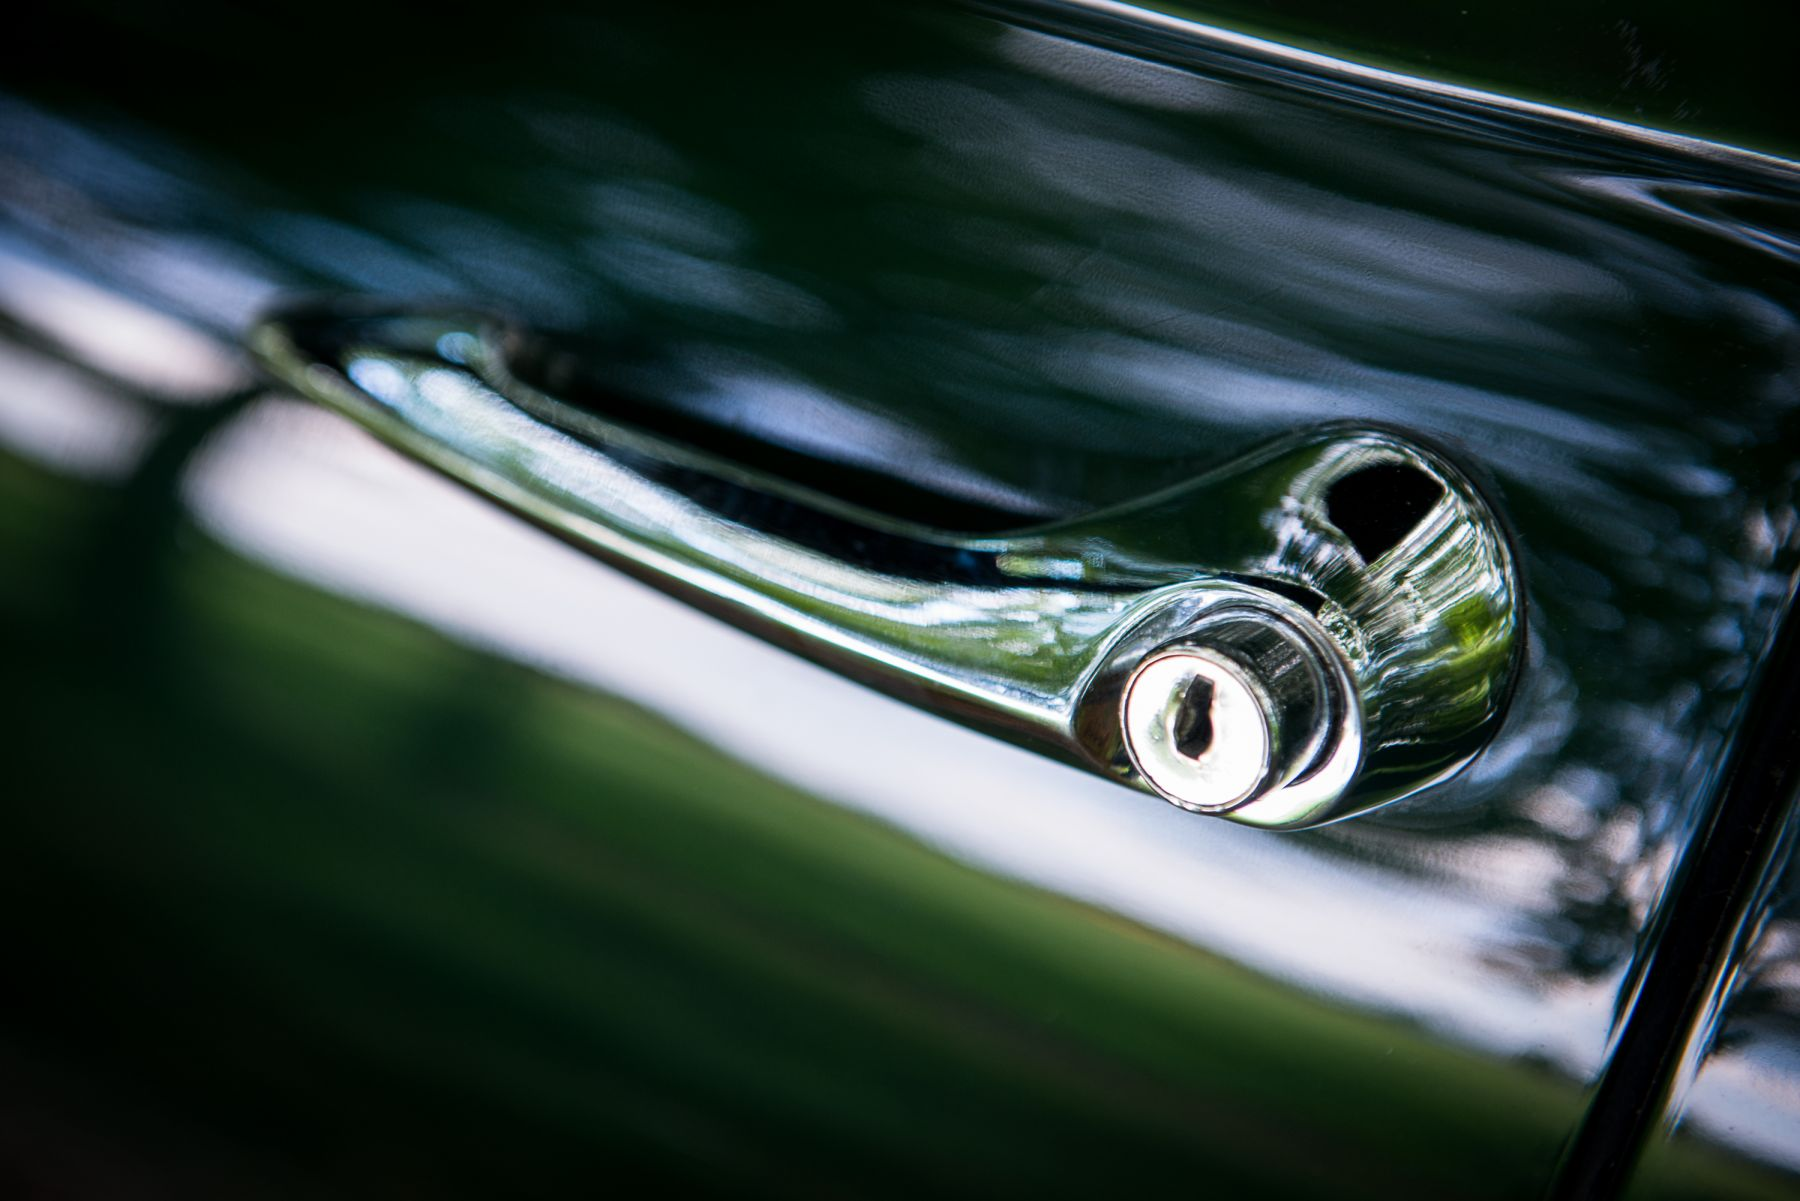 Jaguar E-type 4.2 Fixed Head Coupe 1967